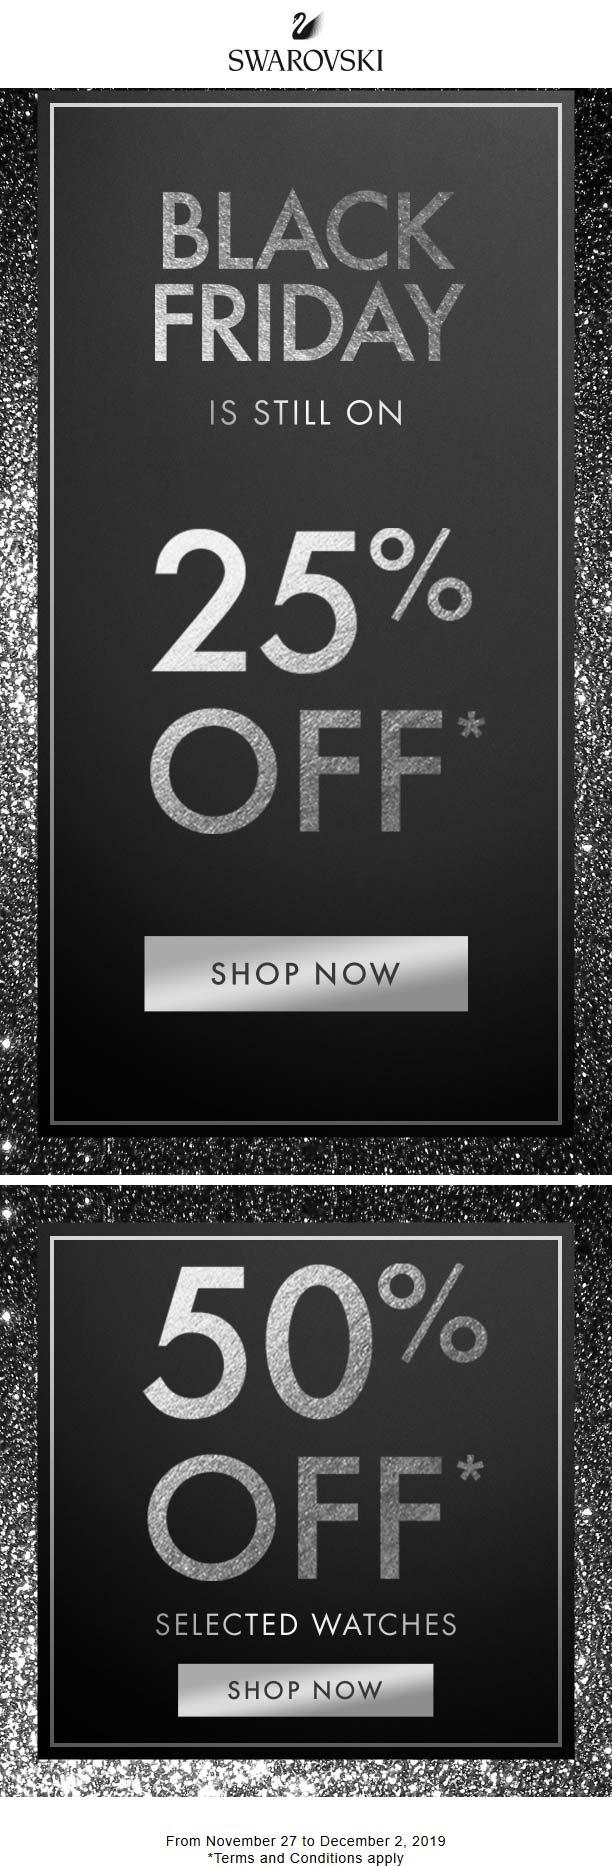 Swarovski Coupon January 2020 25% off at Swarovski, ditto online